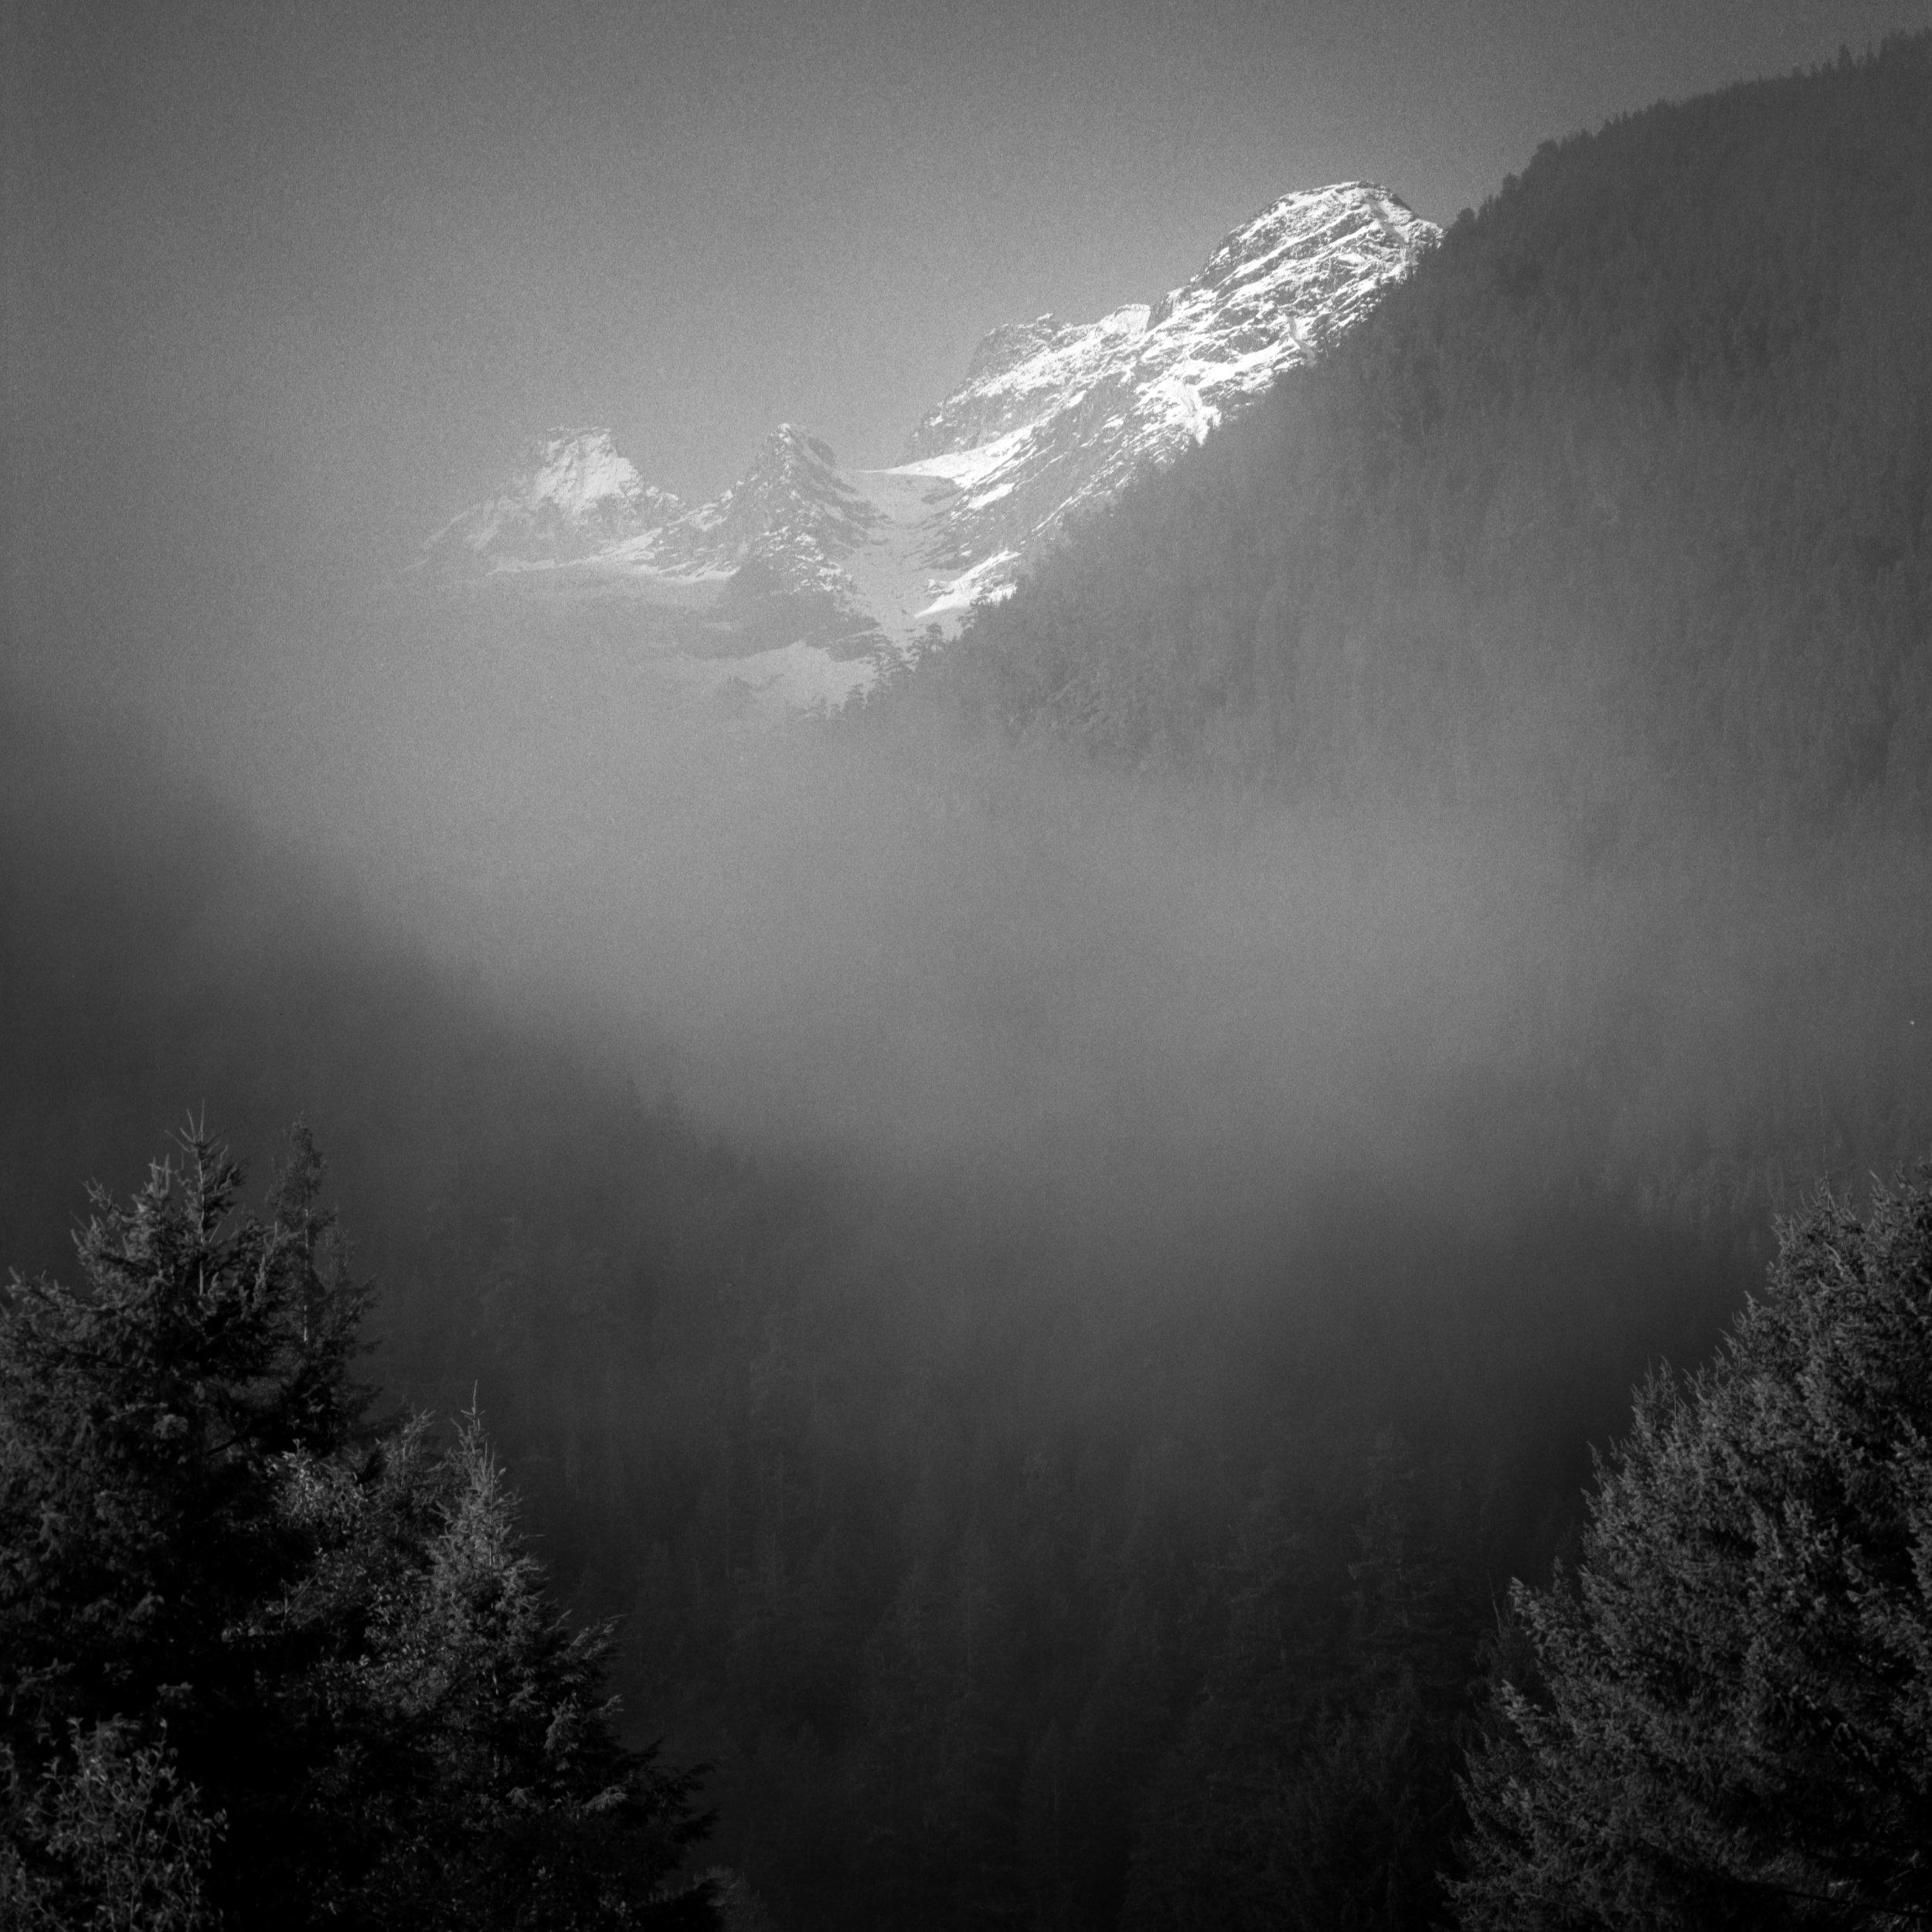 North Cascades, October 2017